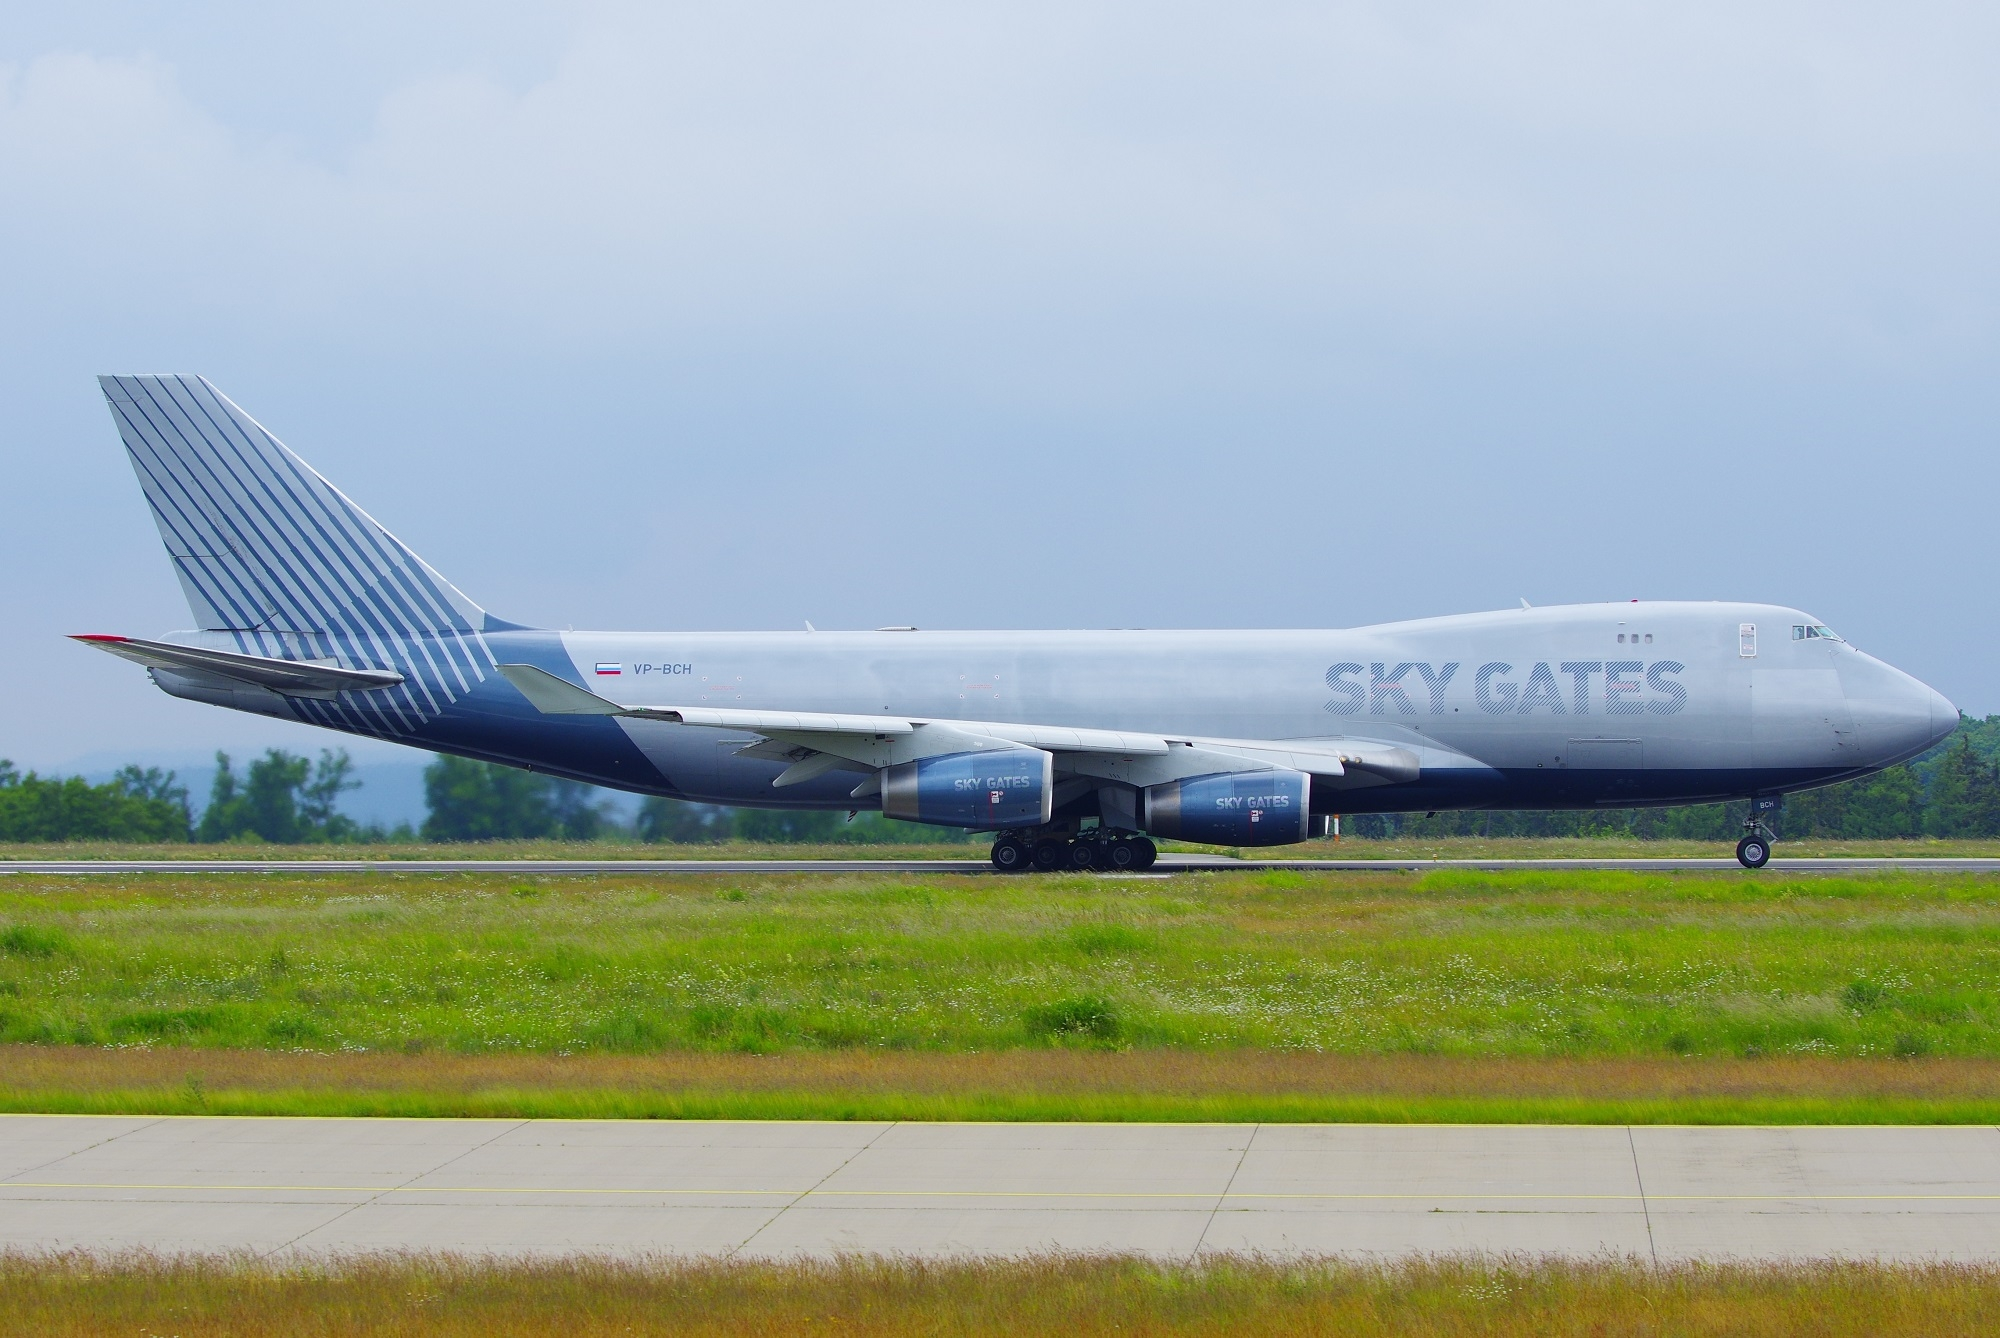 Sky Gate Cargo Airlines Boeing  - brummi | ello